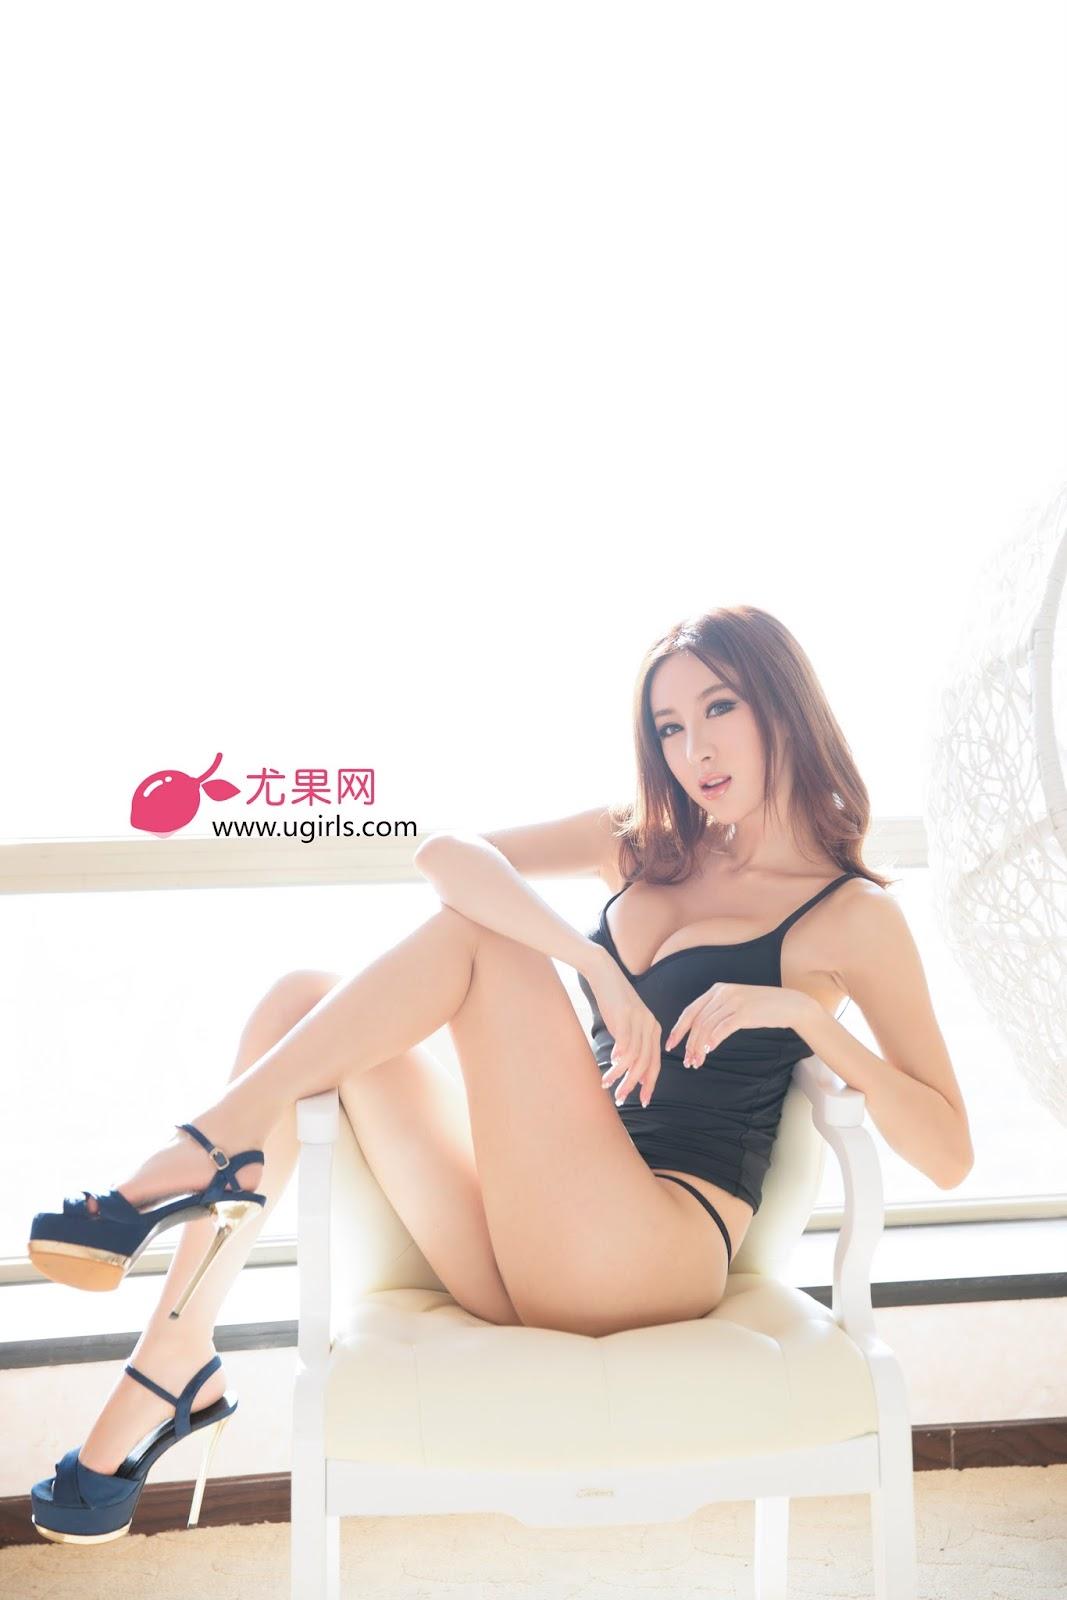 A14A6701 - Hot Photo UGIRLS NO.6 Nude Girl